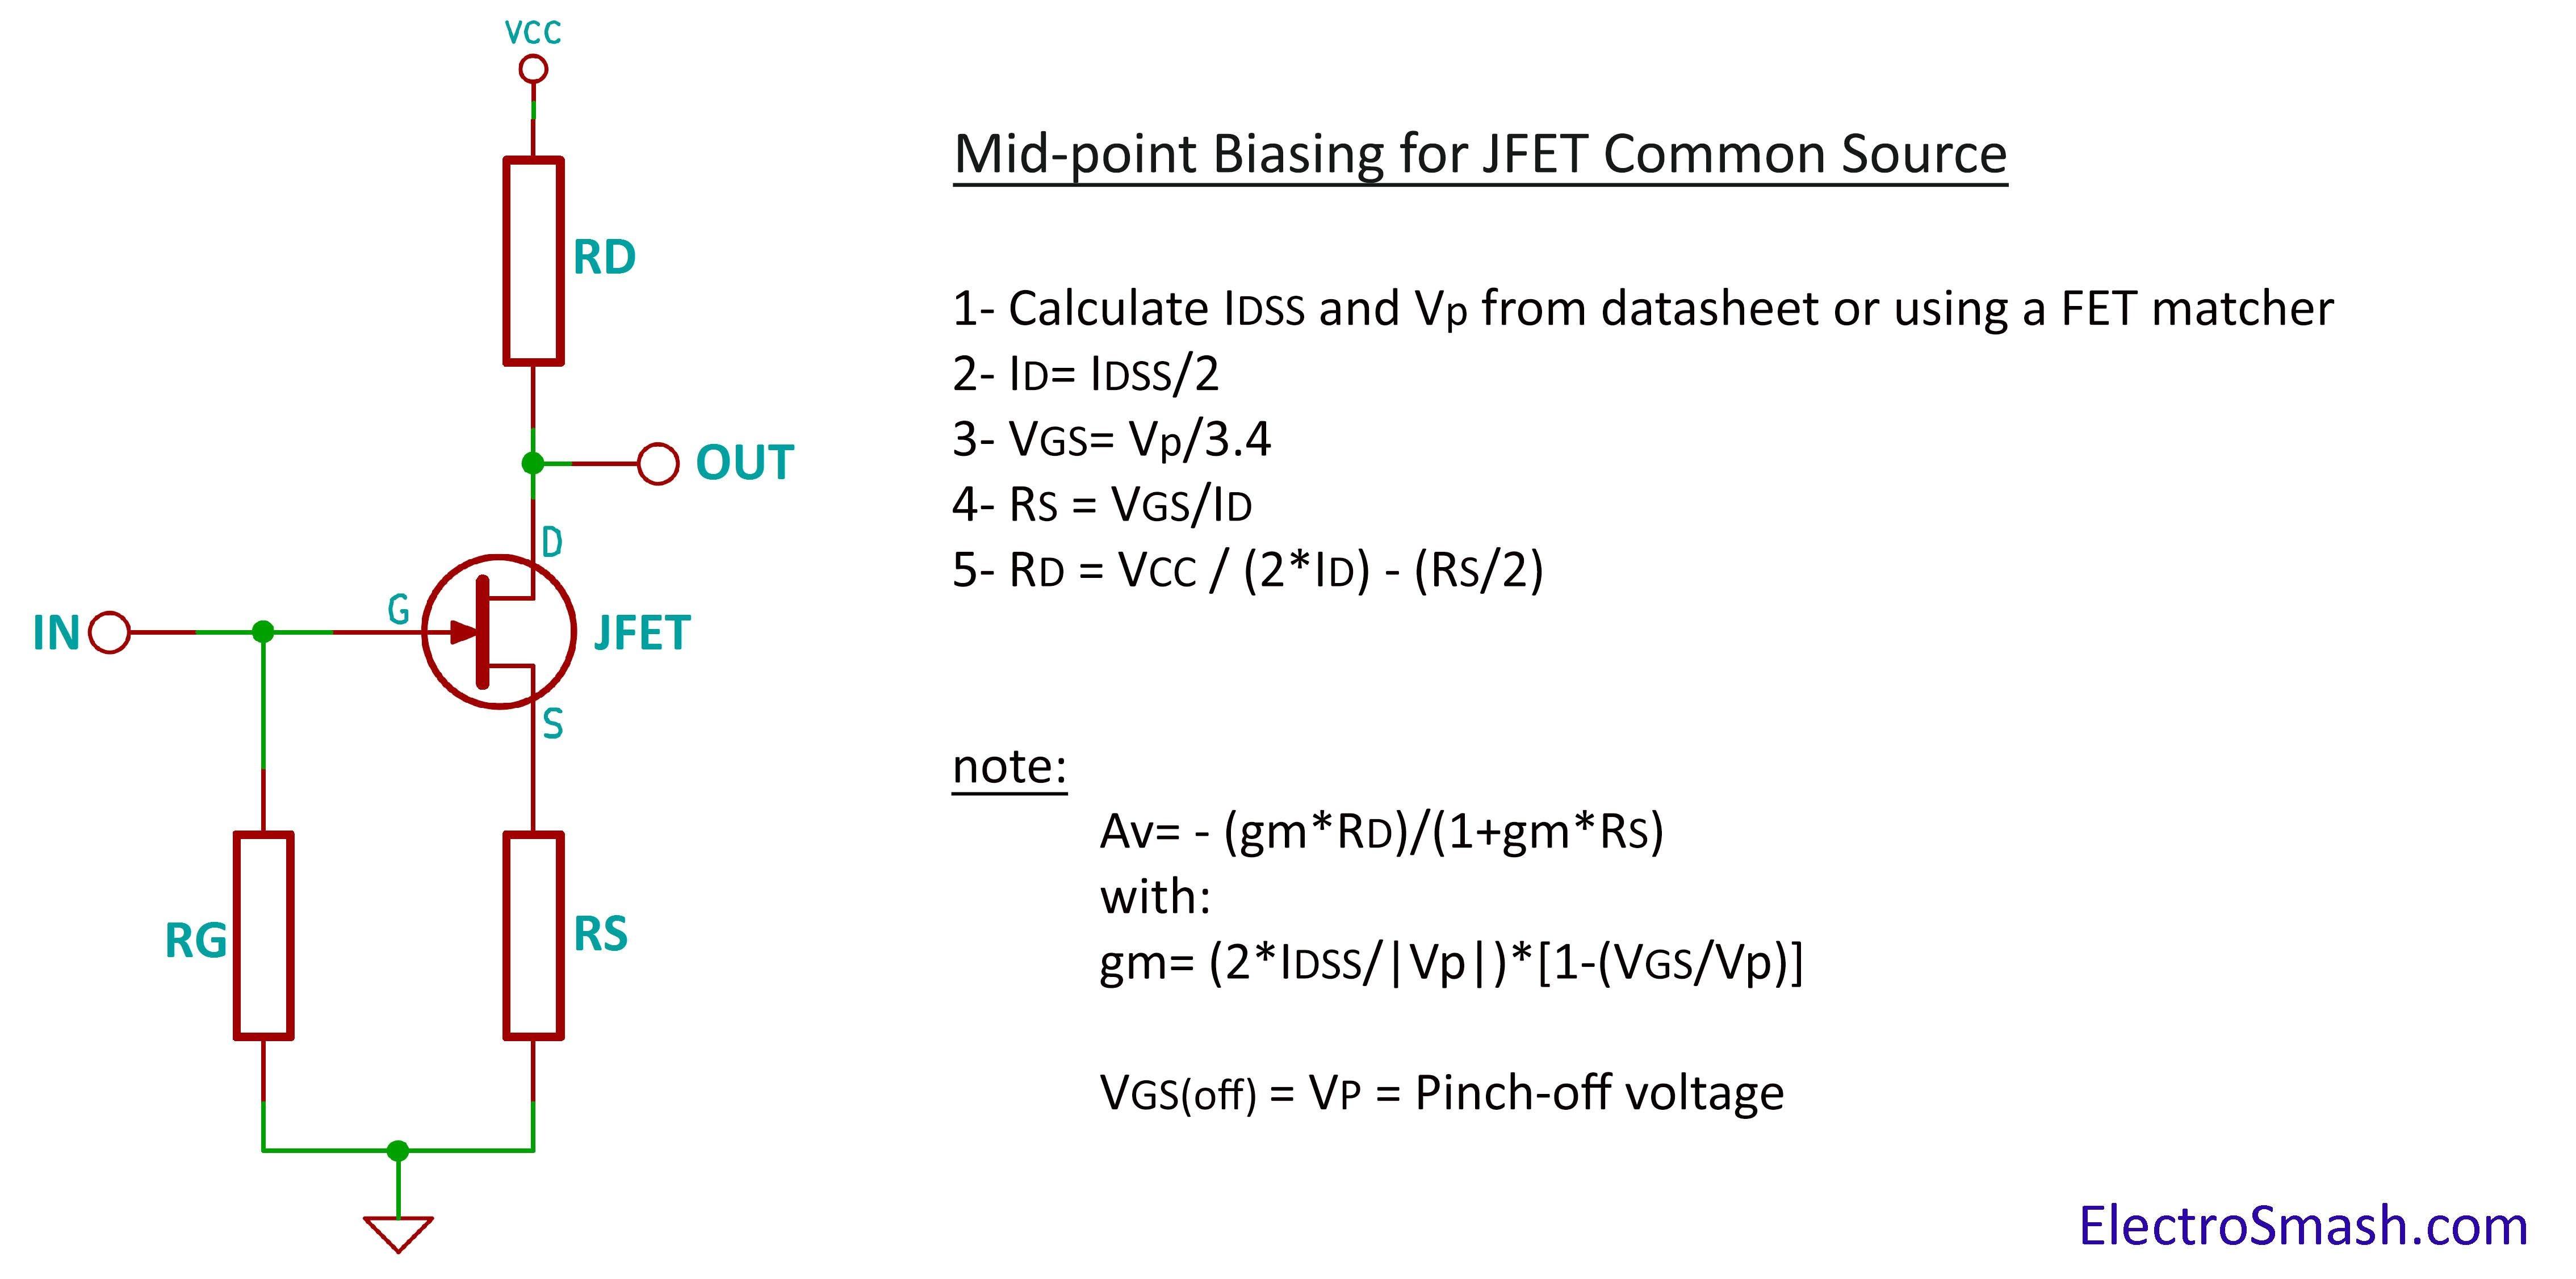 jfet amplifier calculation parameters